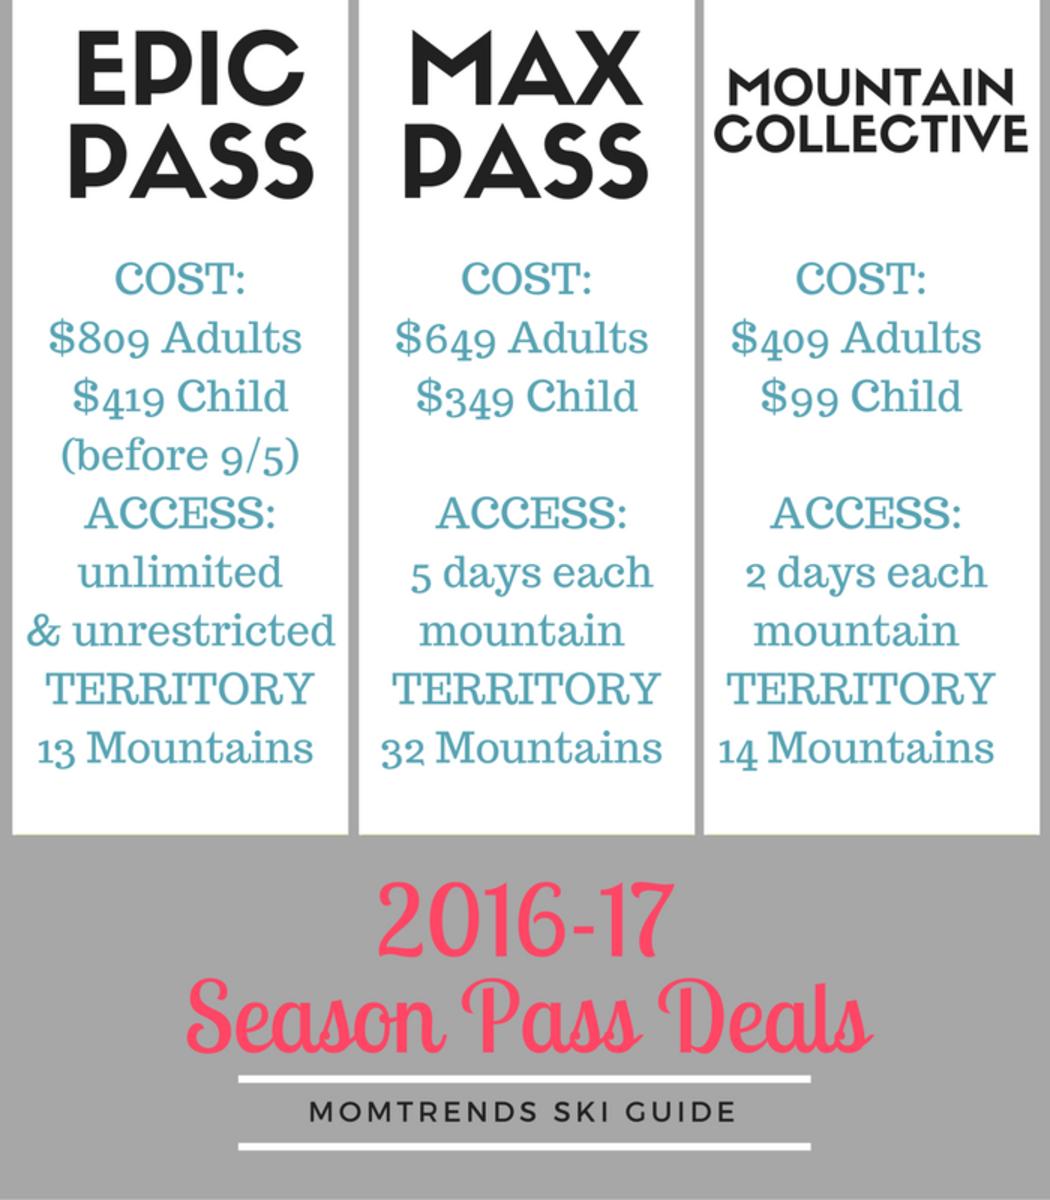 comparing season pass deals